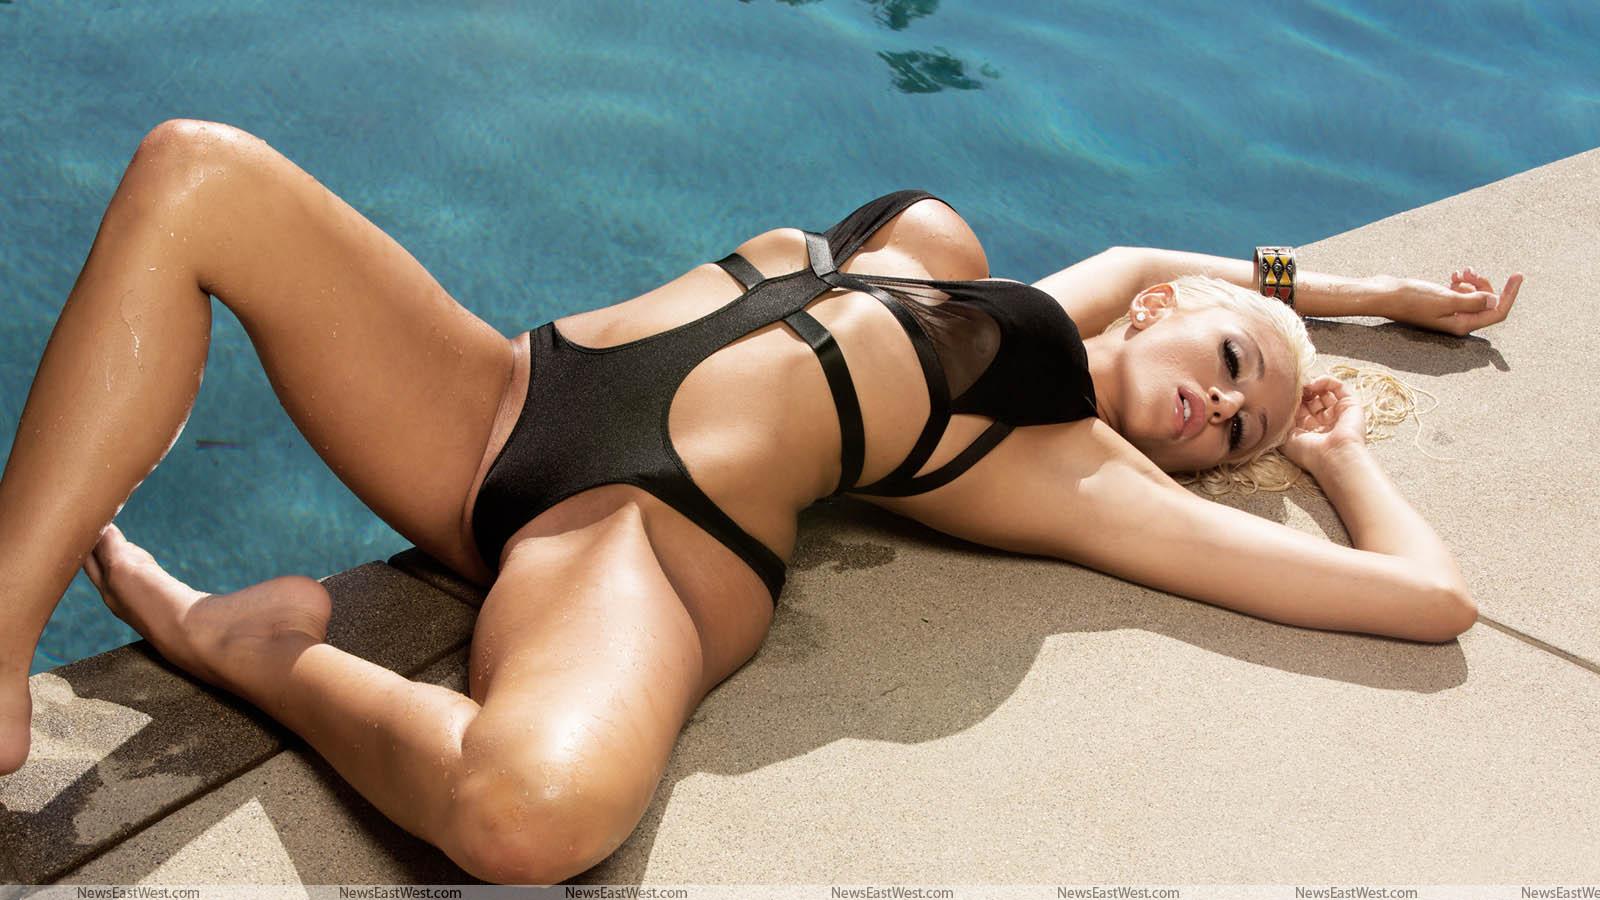 razdvinula-nogi-v-bikini